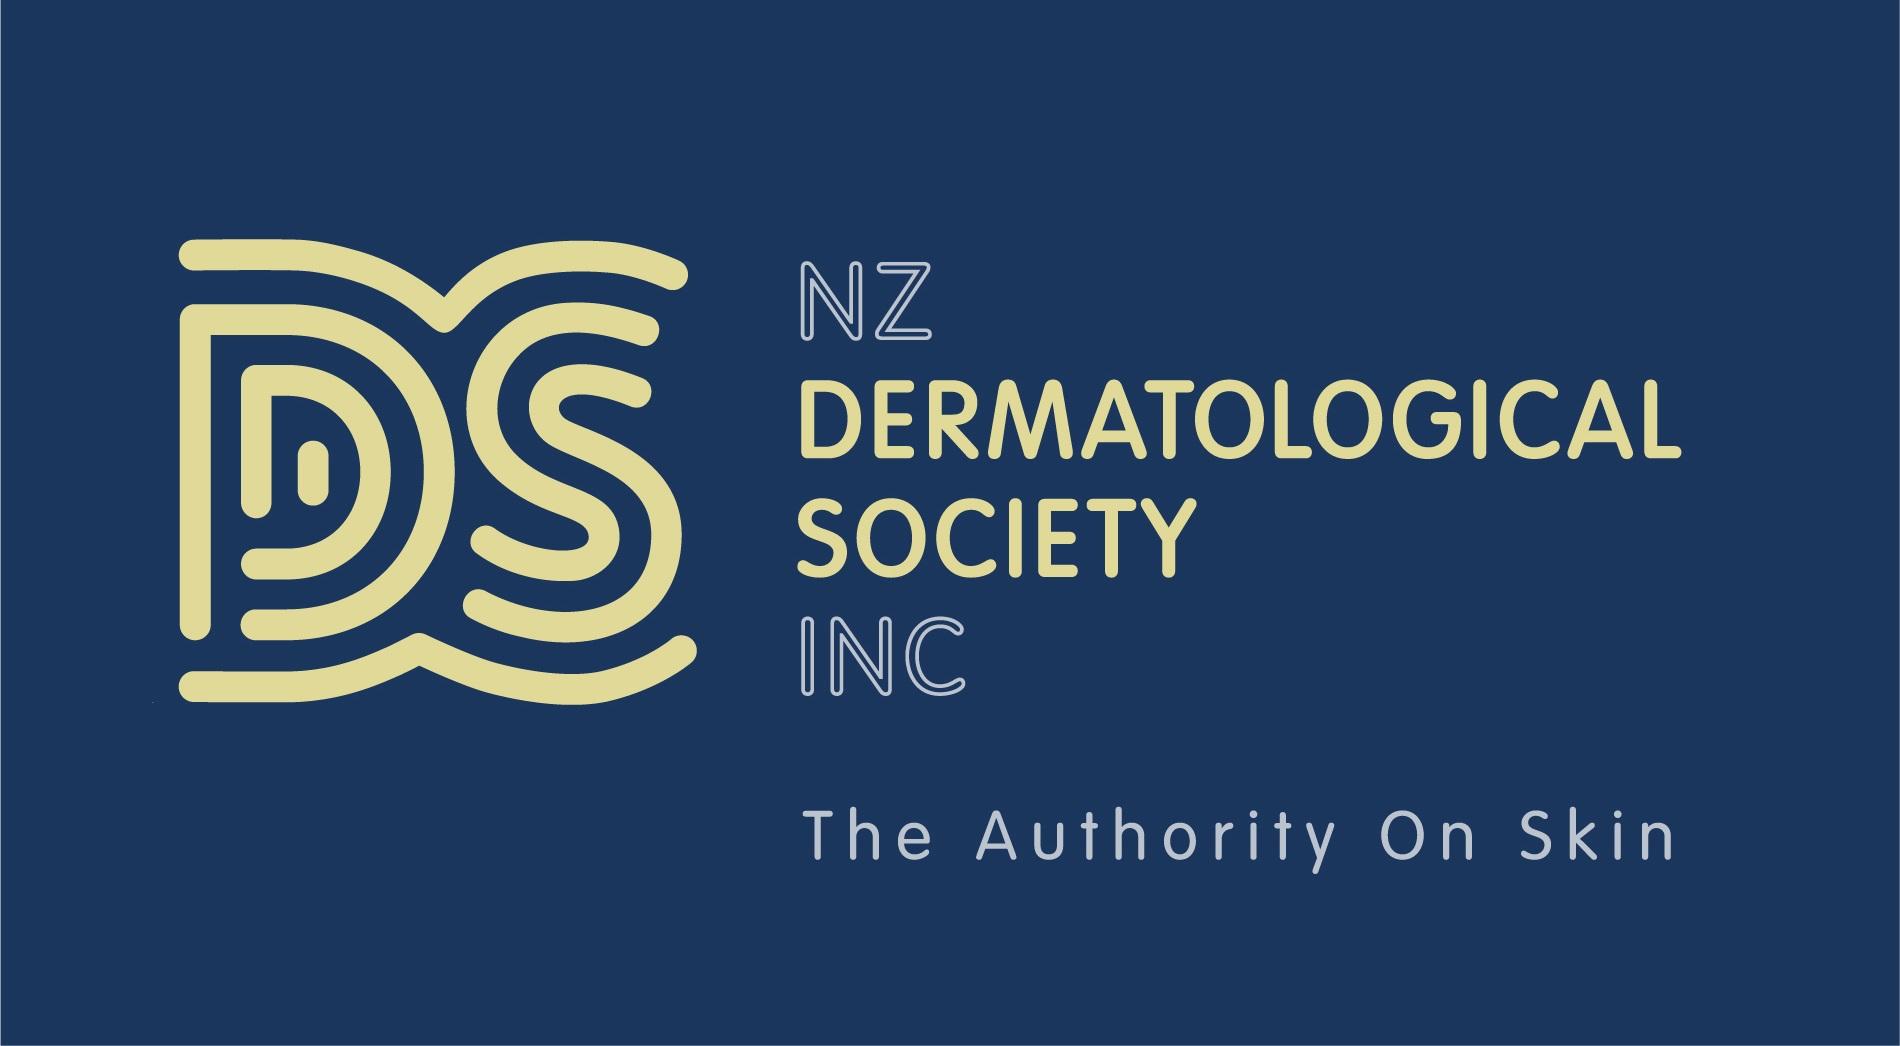 NZD0002+Logo+RGB+indigo.jpg